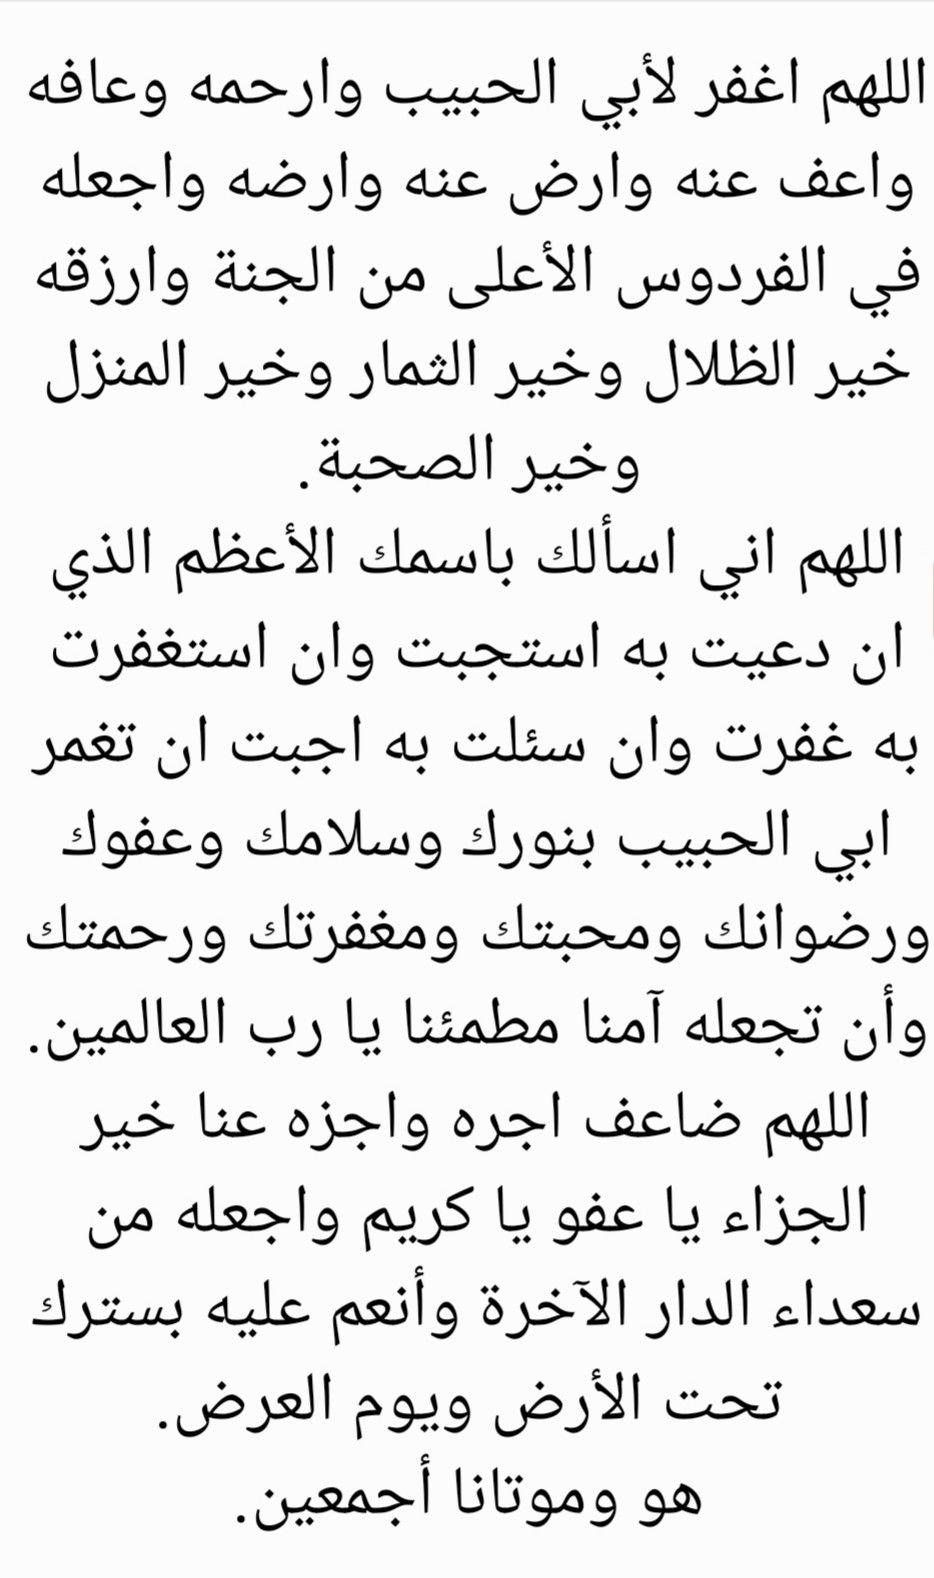 الدعاء للأب Arabic Love Quotes Love Quotes Quotes